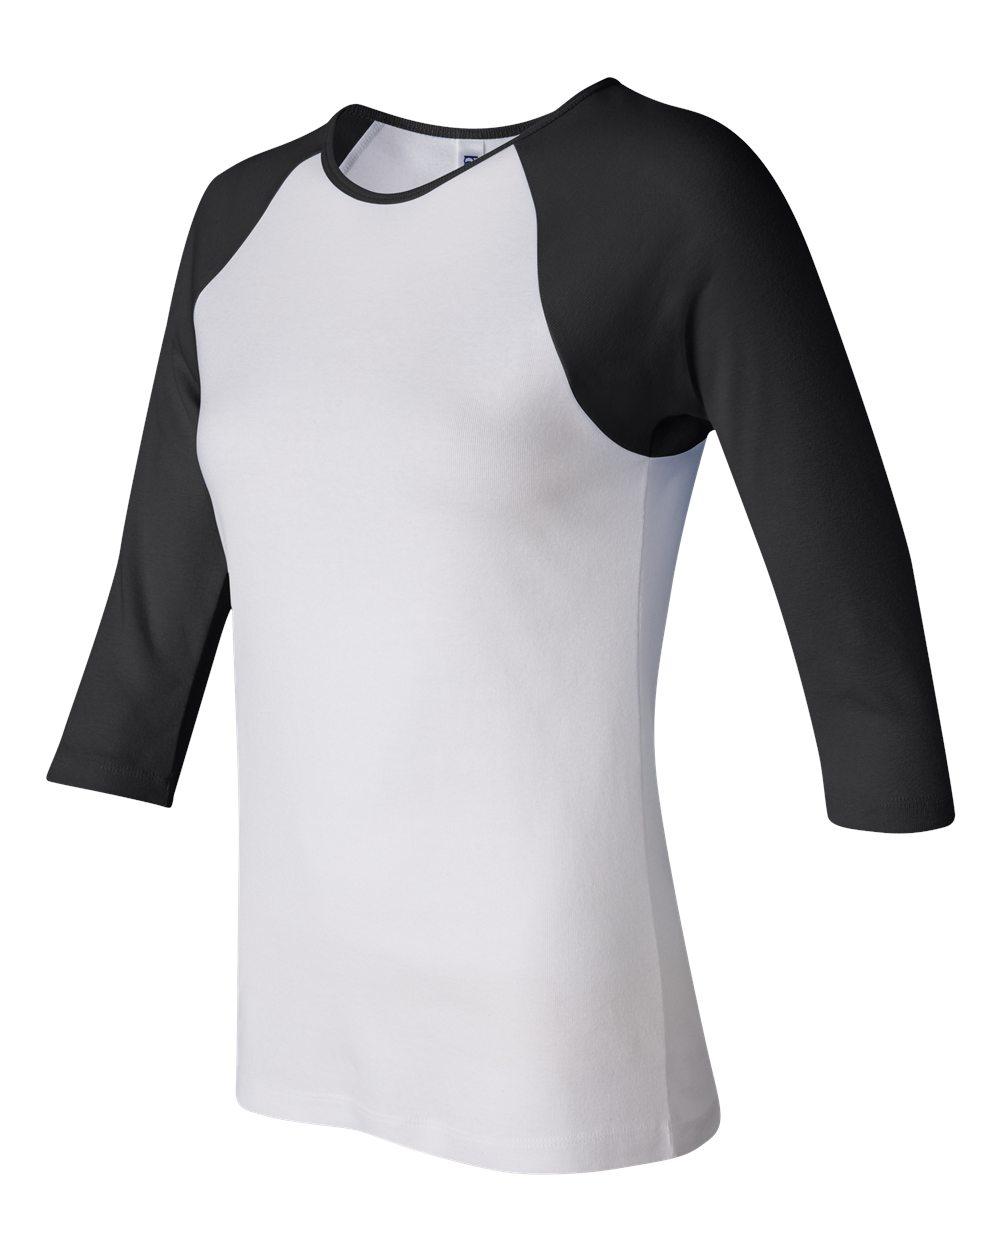 Bella-Canvas-Womens-Stretch-Rib-3-4-Sleeve-Contrast-Raglan-T-Shirt-B2000 thumbnail 13